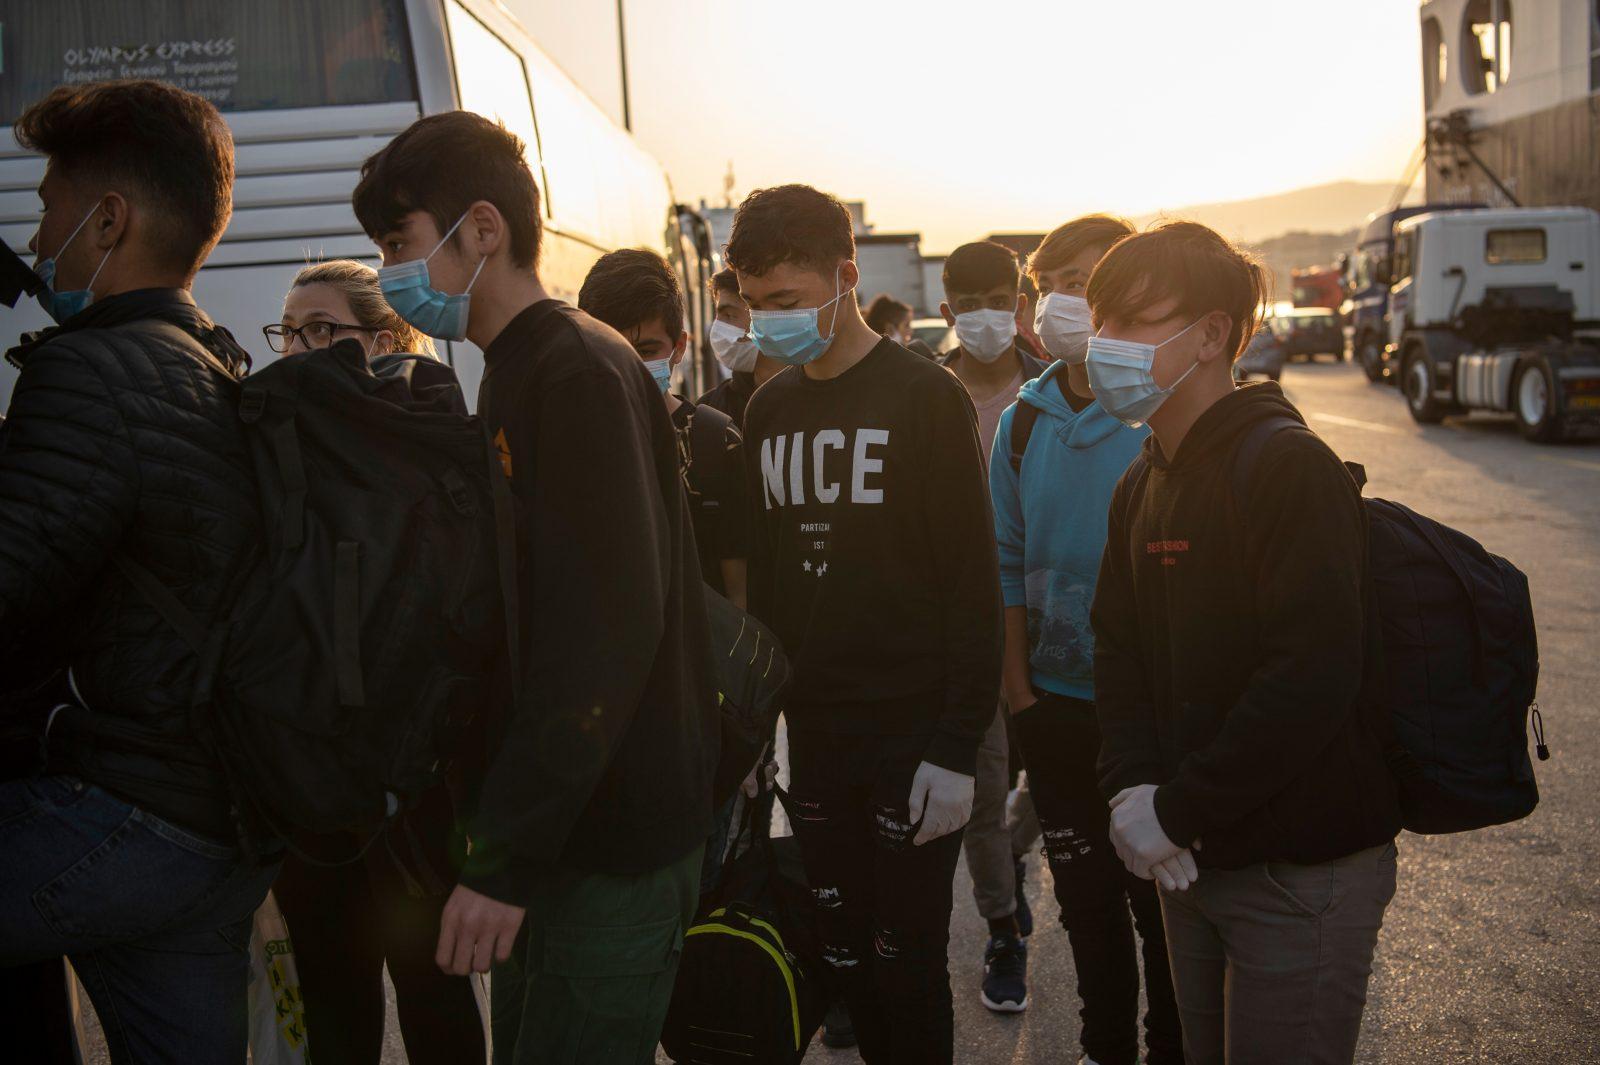 Unbegleitete minderjährige Migranten